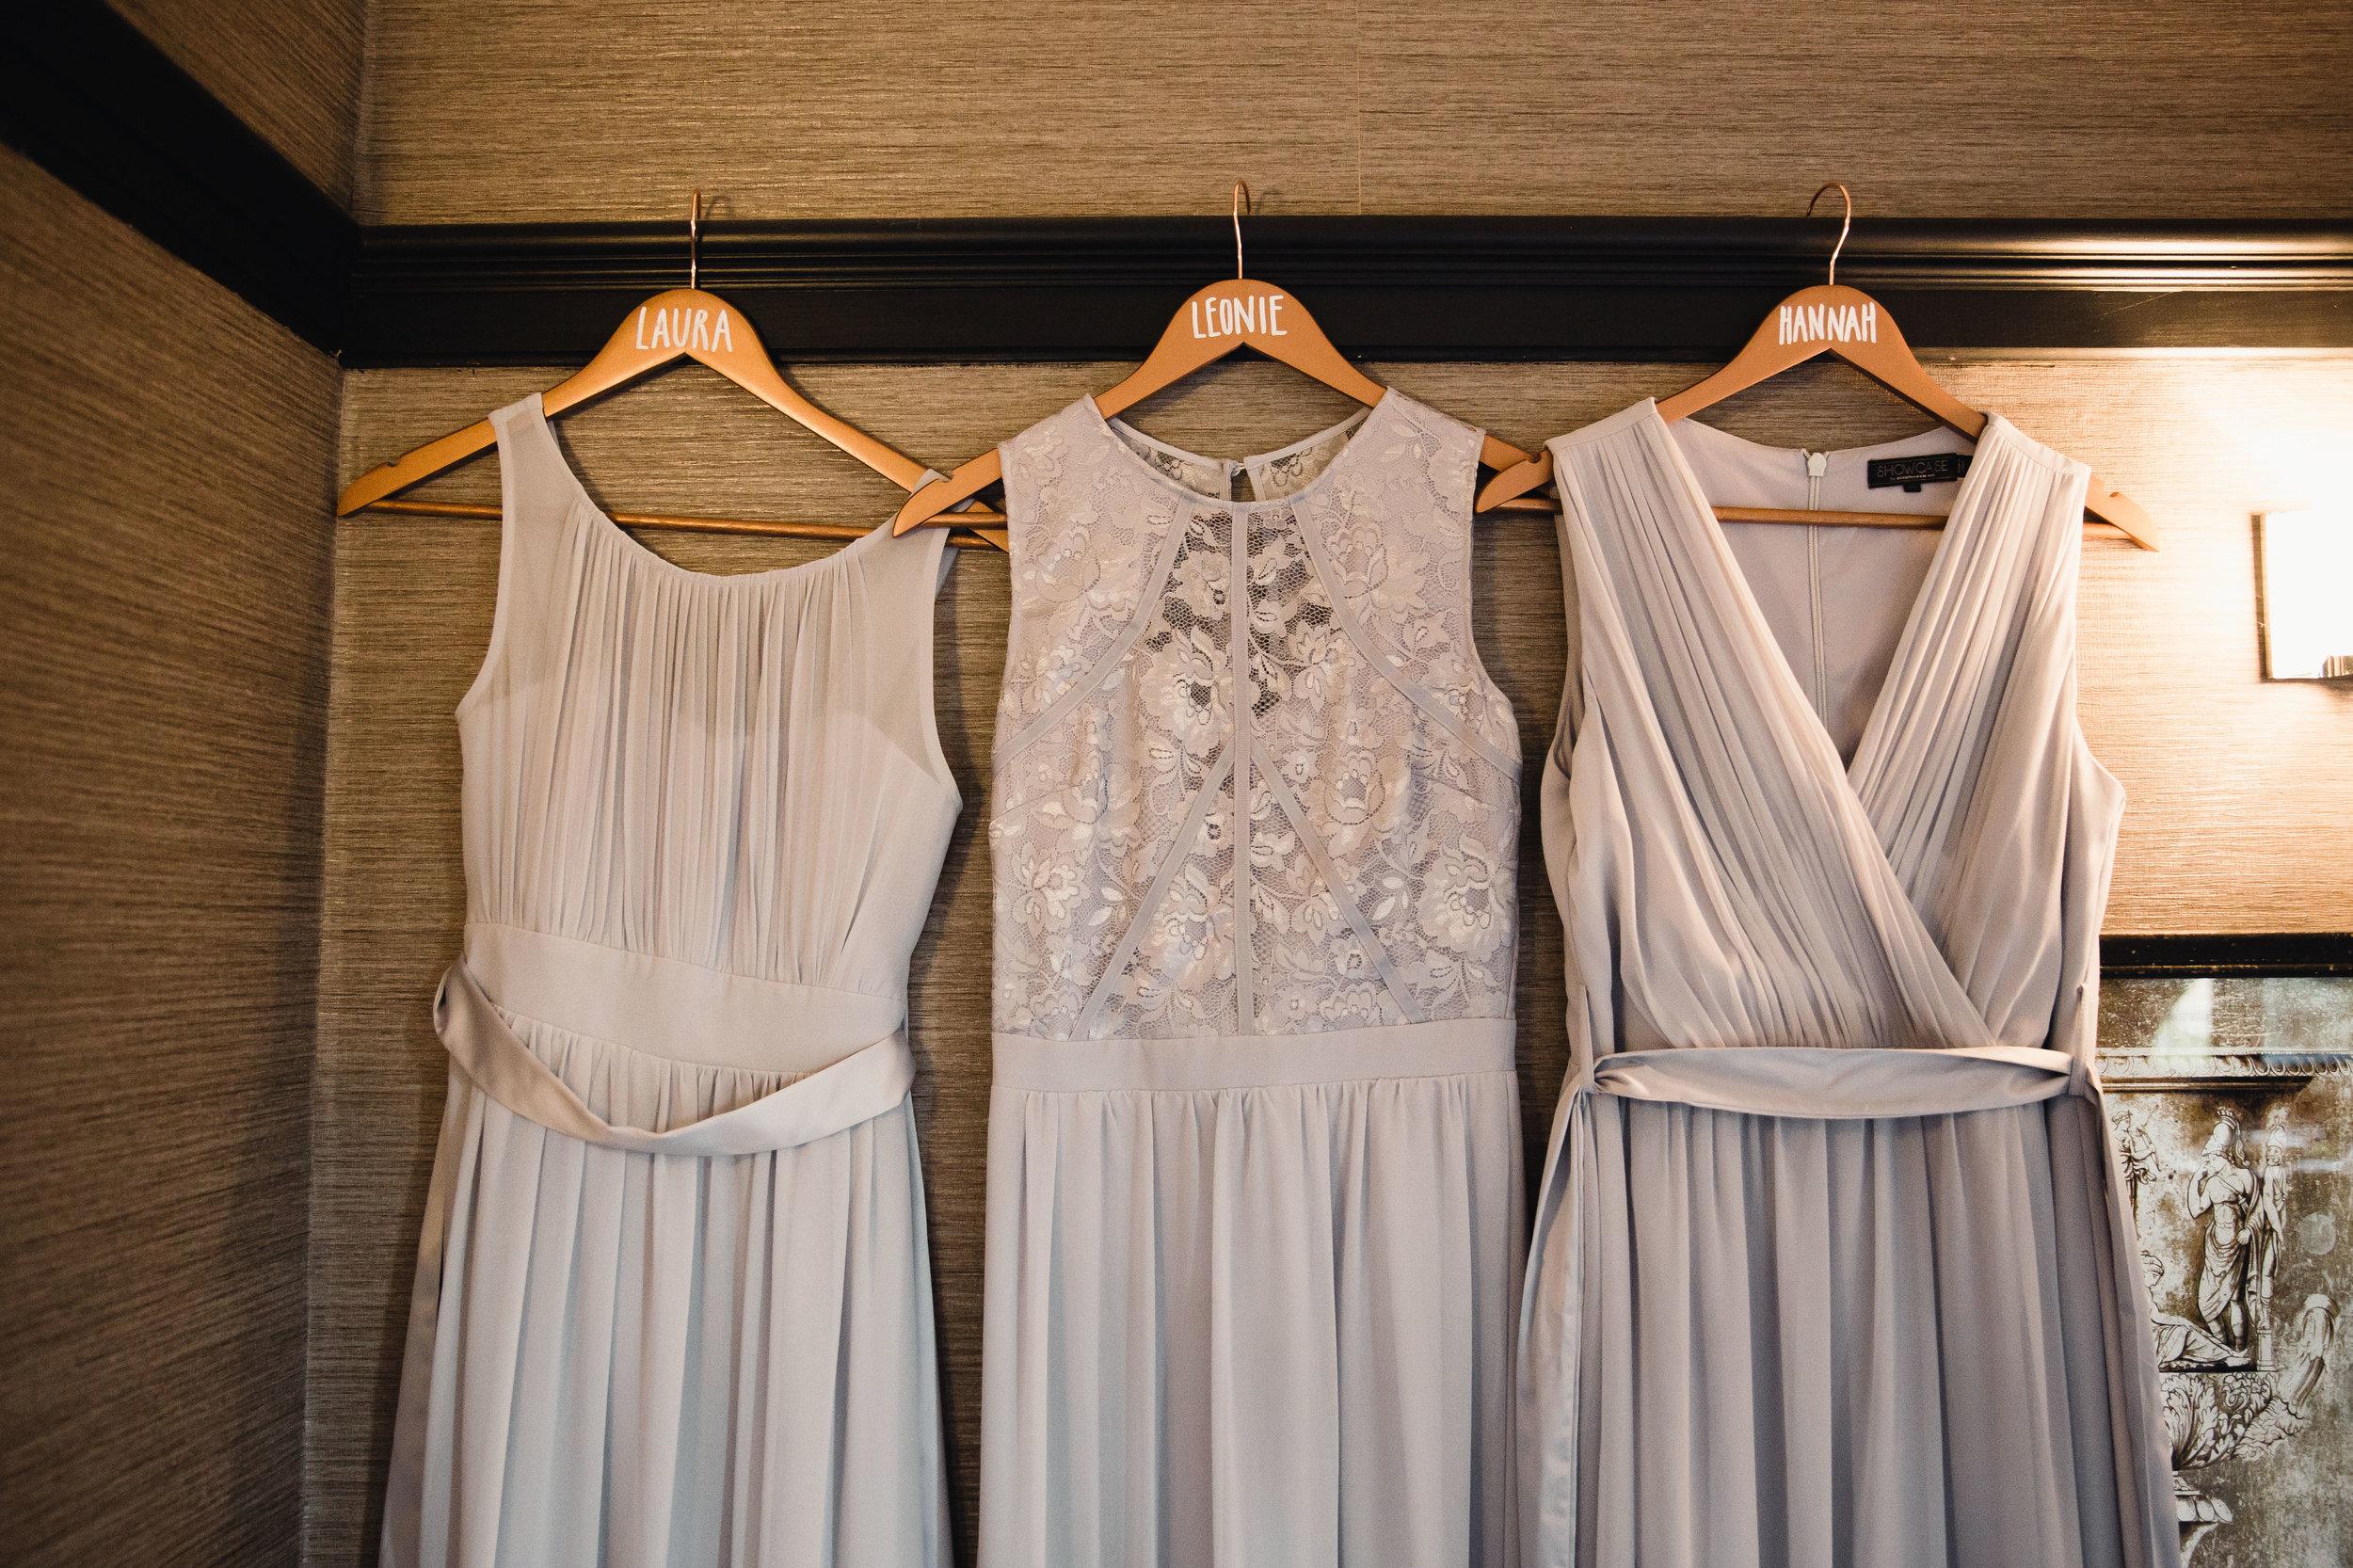 Hanging bridesmaids dresses at Falcon Manor Wedding Photography Yorkshire